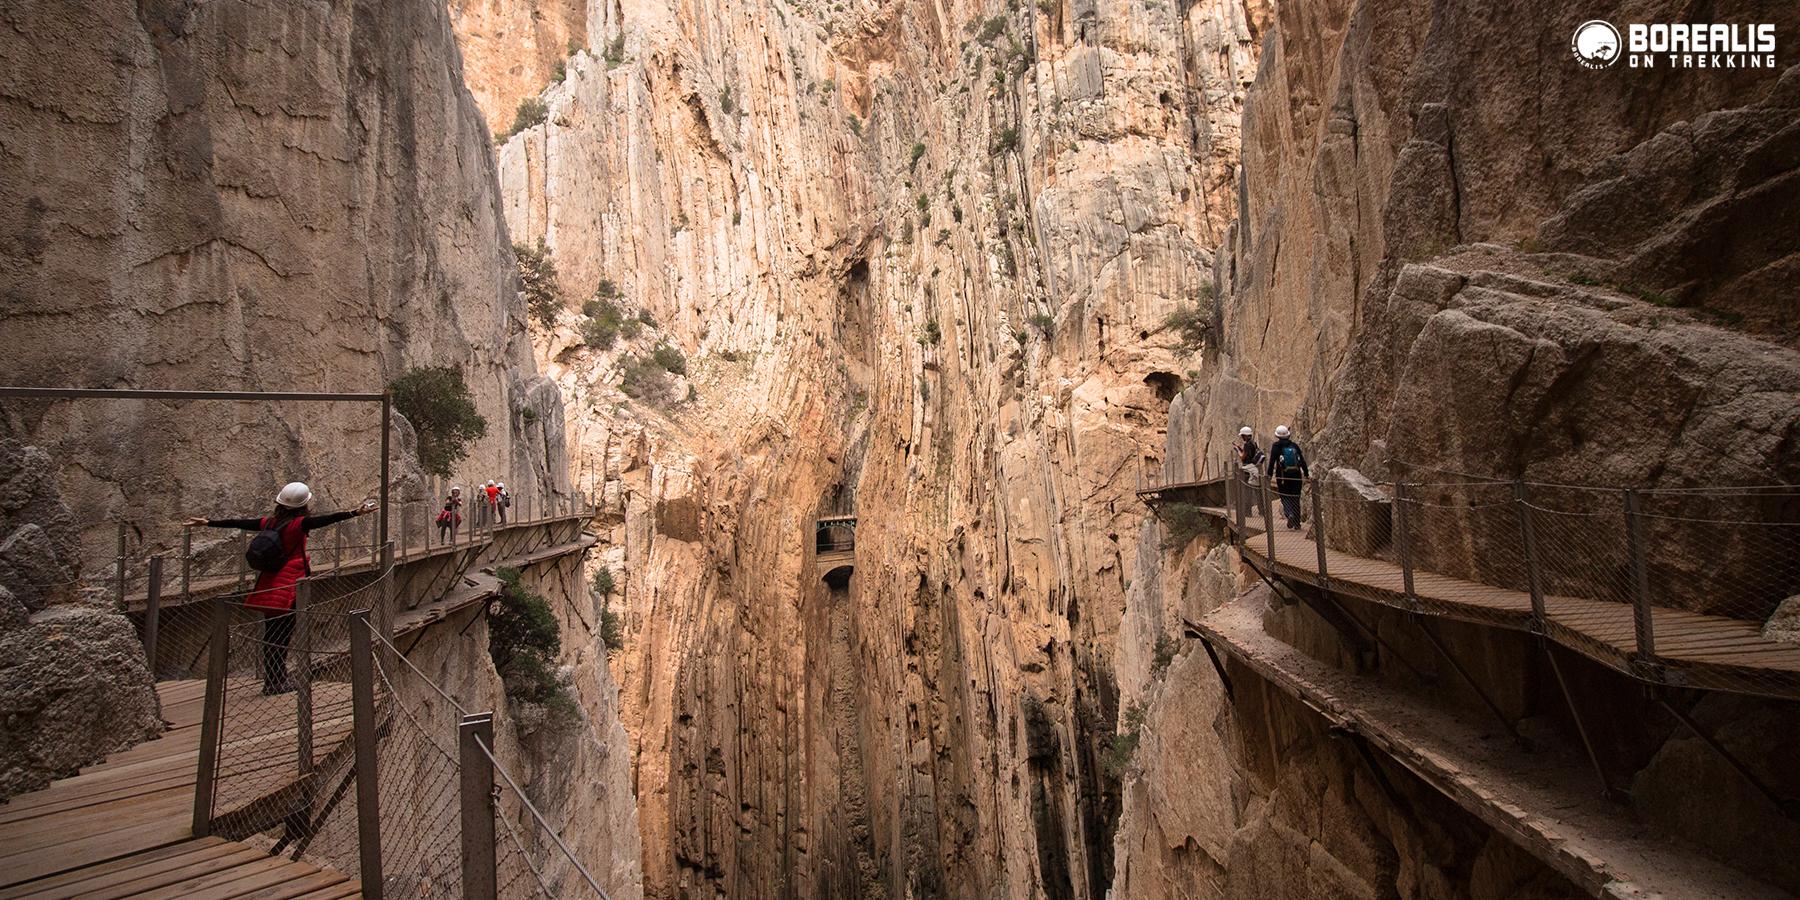 Caminito del Rey Borealis Desfiladeiro Gaitanes